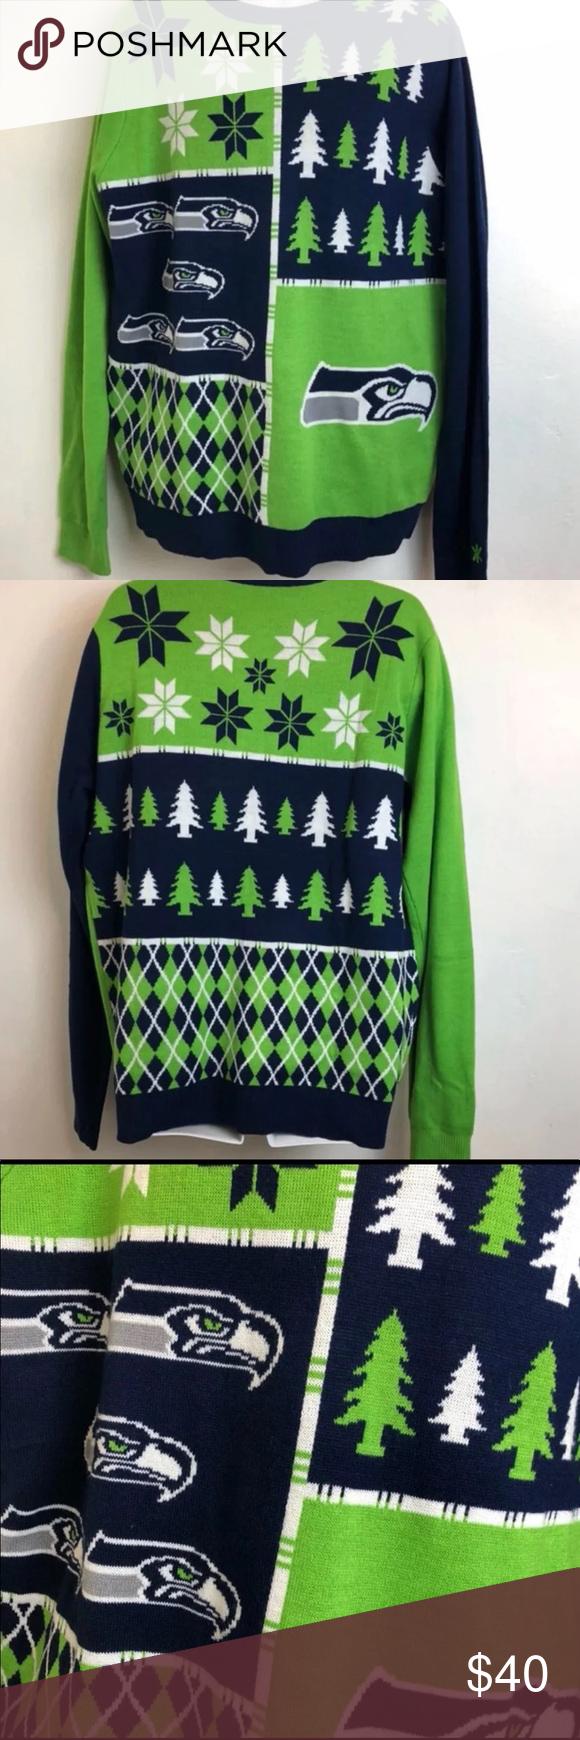 Seattle Seahawks Ugly Christmas Sweater Xl My Posh Closet